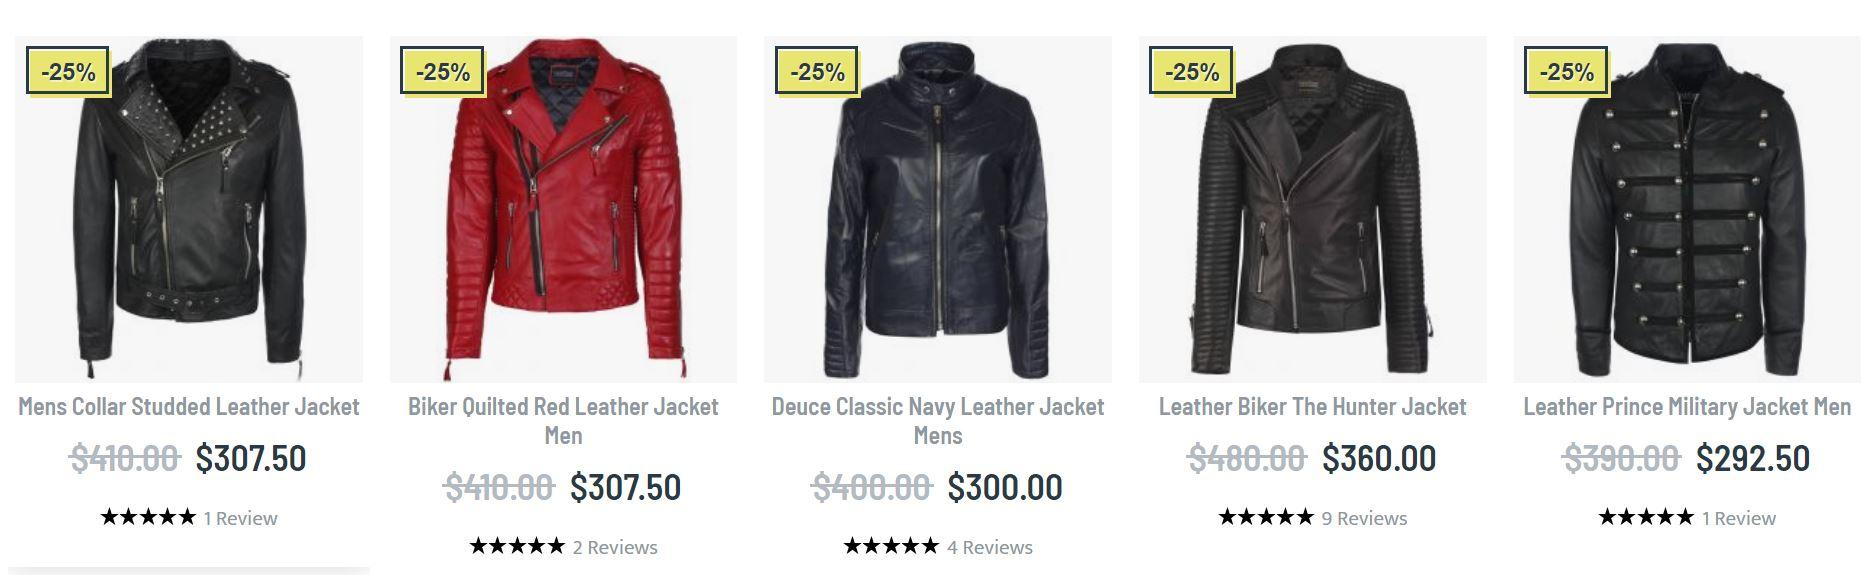 Leather jackets mens biker